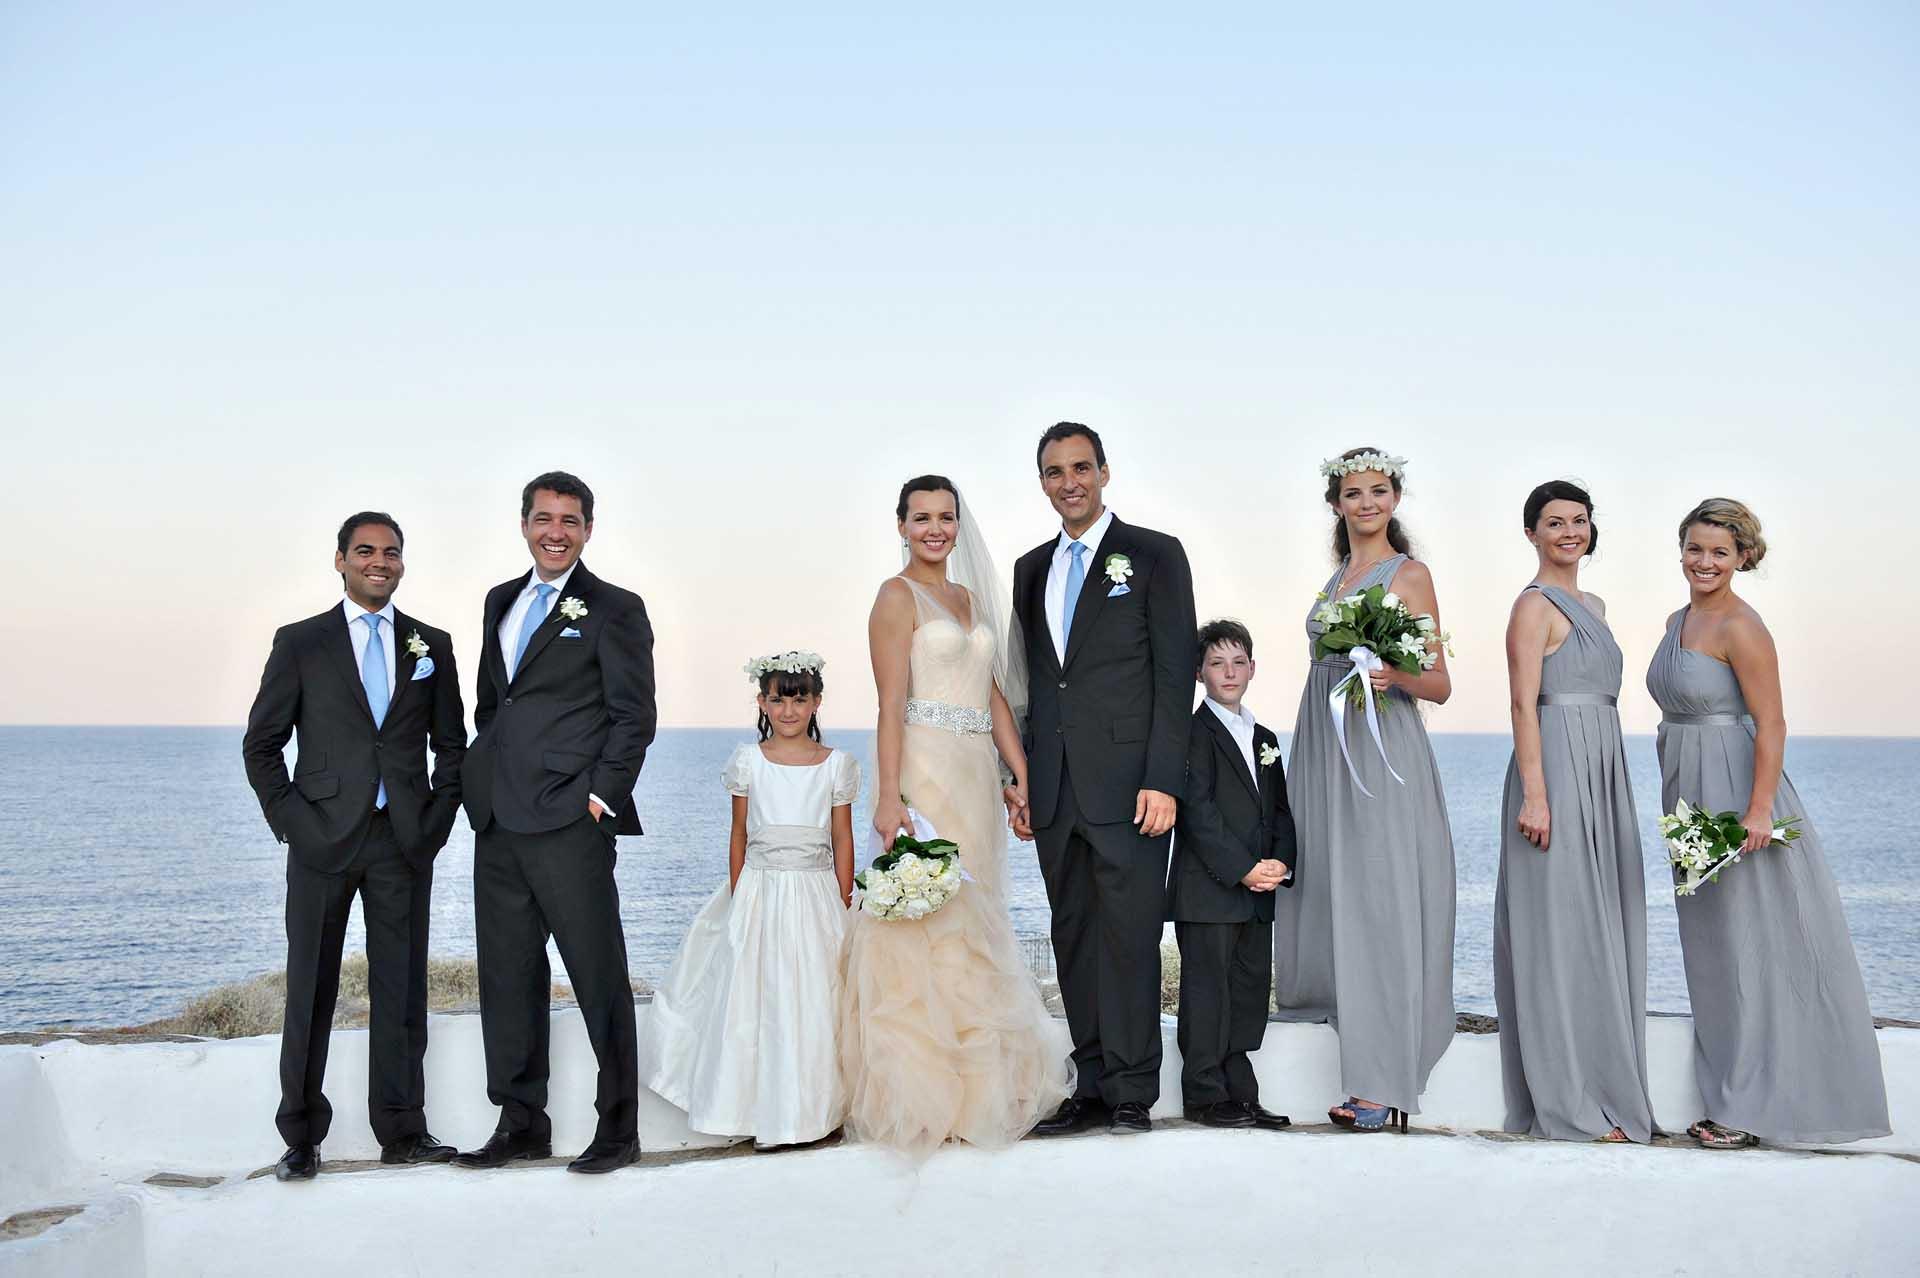 destination-wedding-sifnos group portrait copy